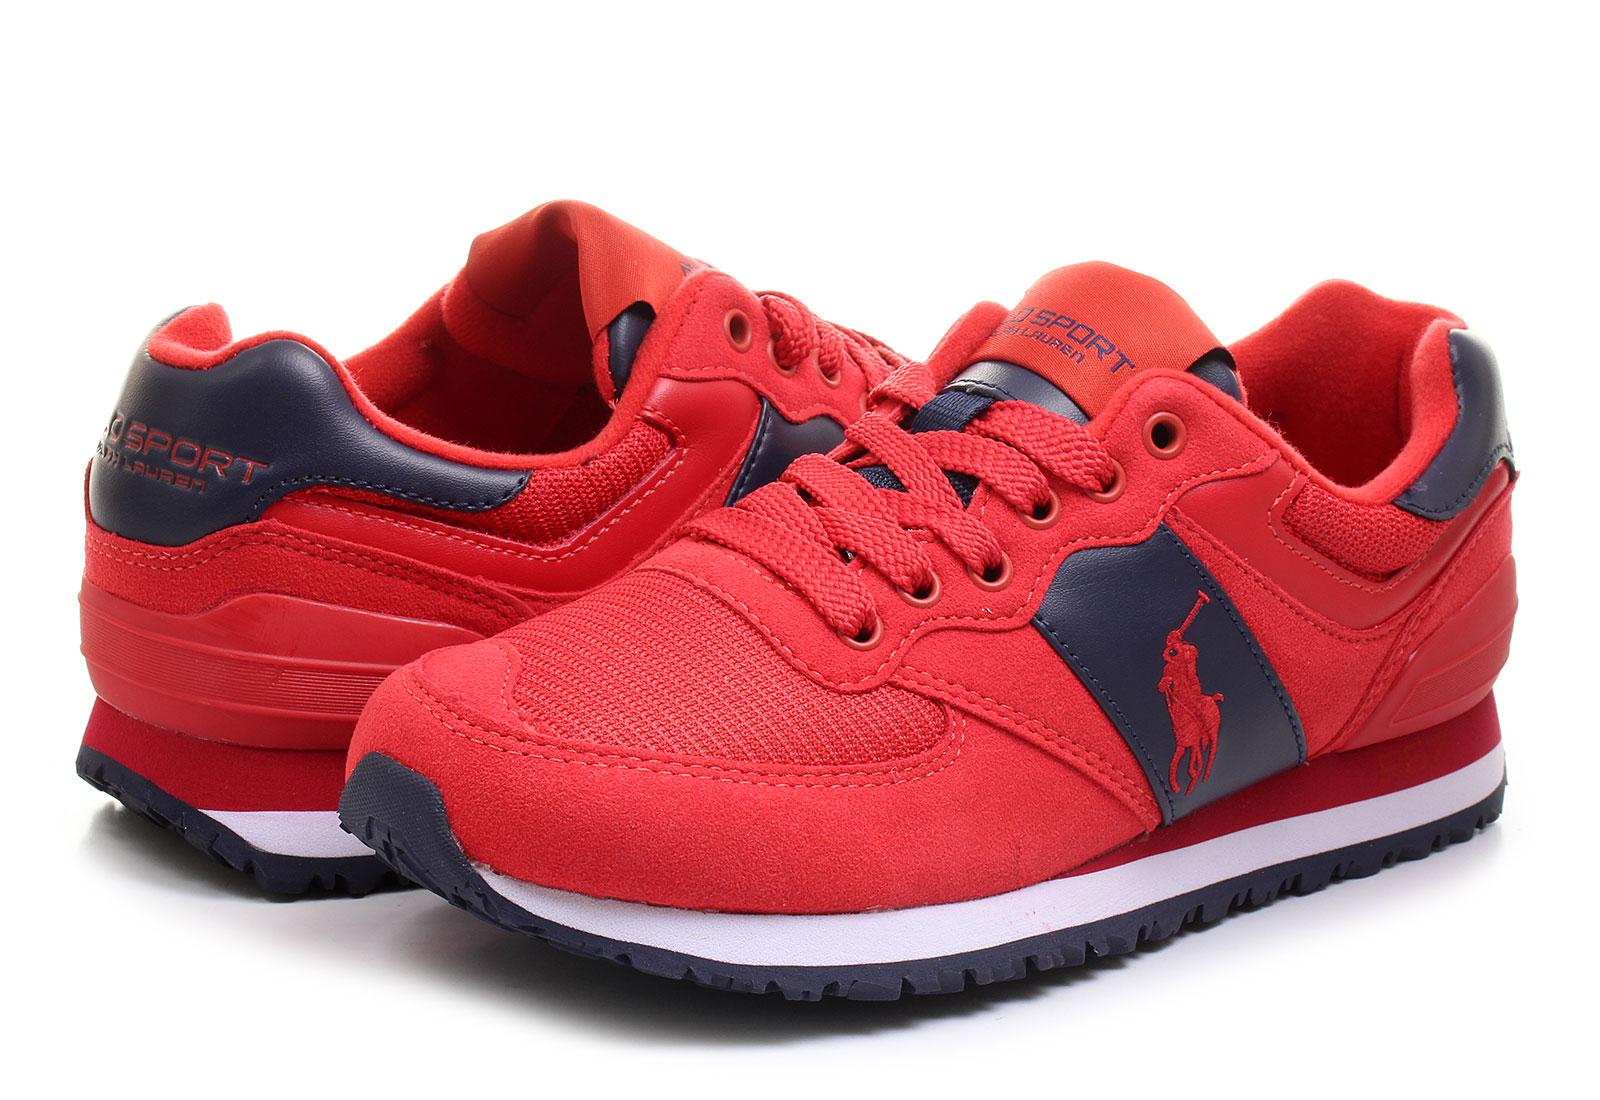 Polo Ralph Lauren Shoes Online